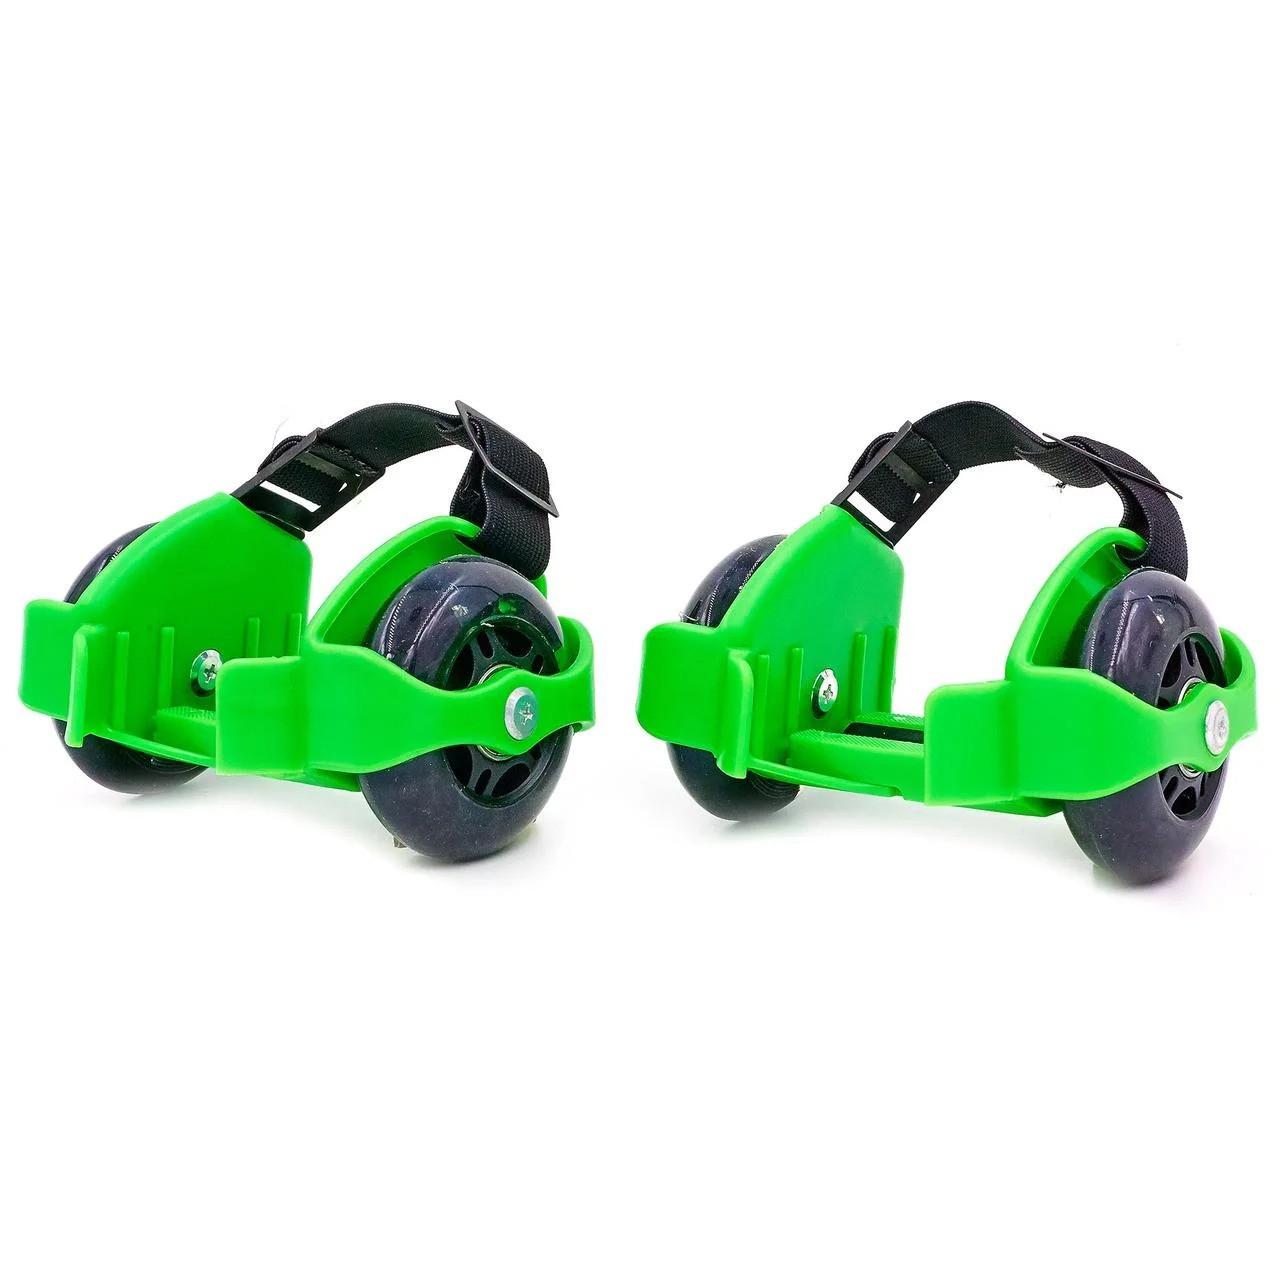 Съемные ролики на обувь Small whirlwind pulley Зеленые, ролики на обувь купить | знімні ролики на взуття (GK)